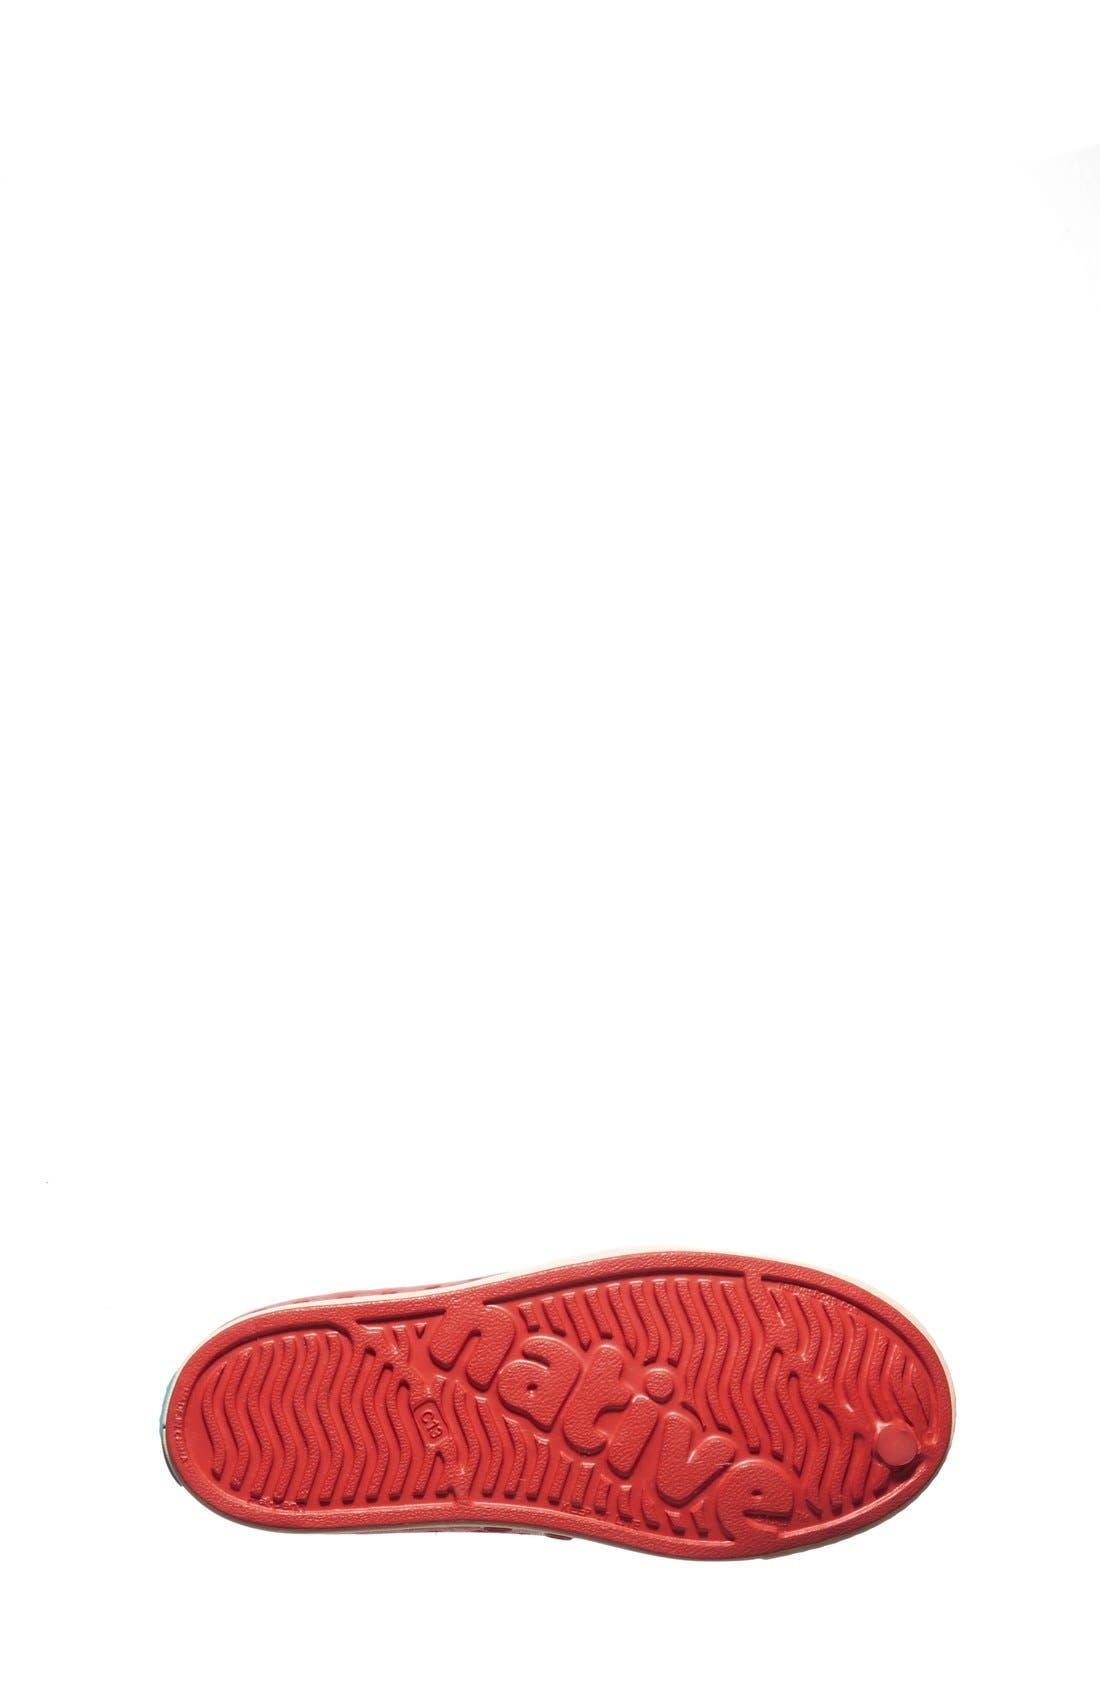 'Jefferson' Water Friendly Slip-On Sneaker,                             Alternate thumbnail 110, color,